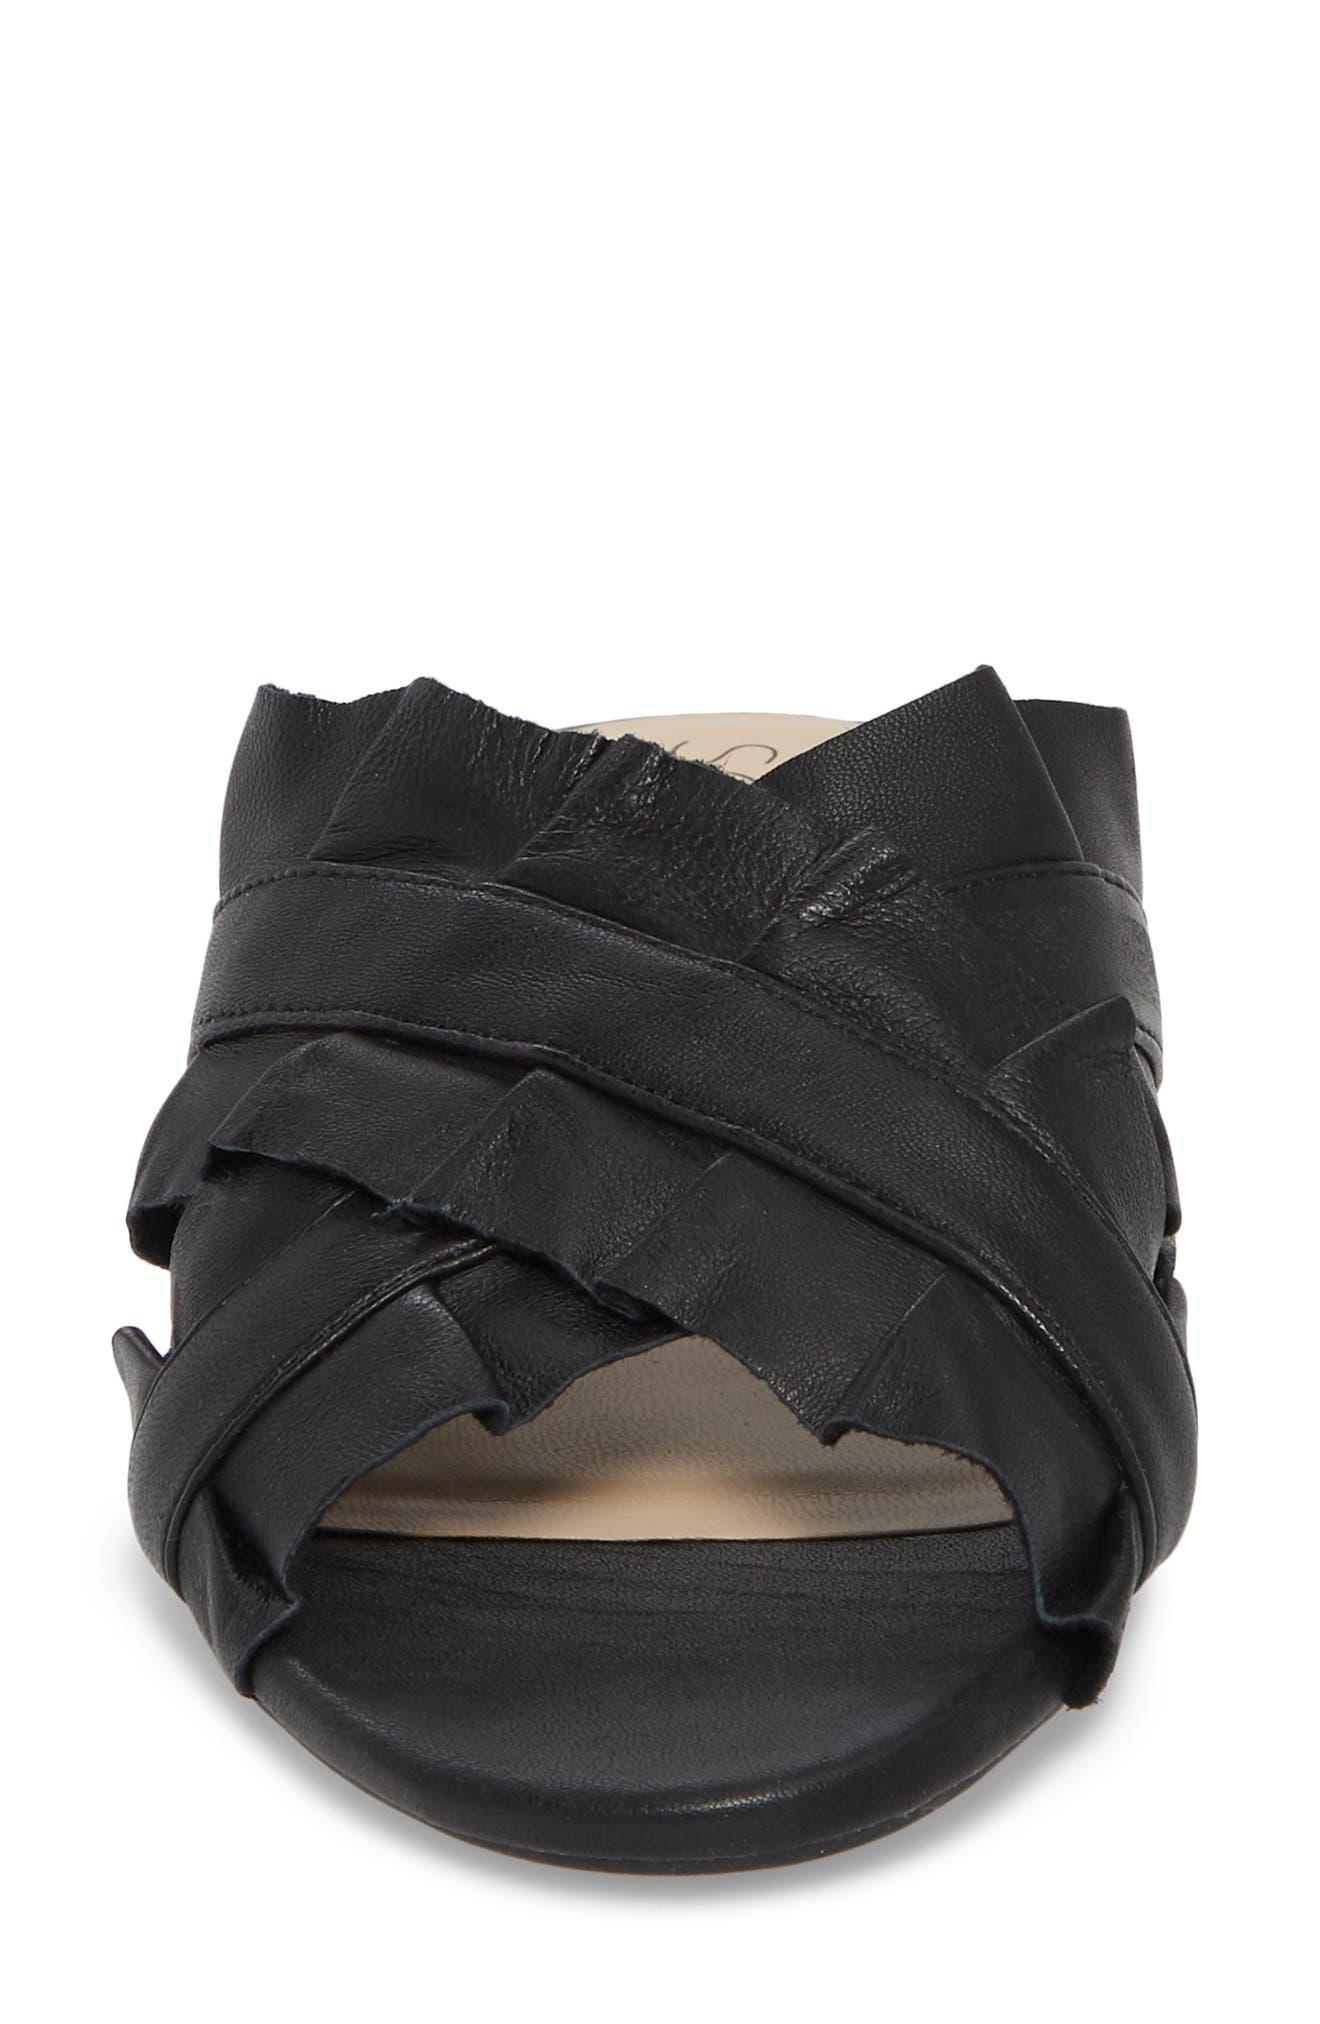 SOLE SOCIETY,                             Mandi Slide Sandal,                             Alternate thumbnail 4, color,                             BLACK